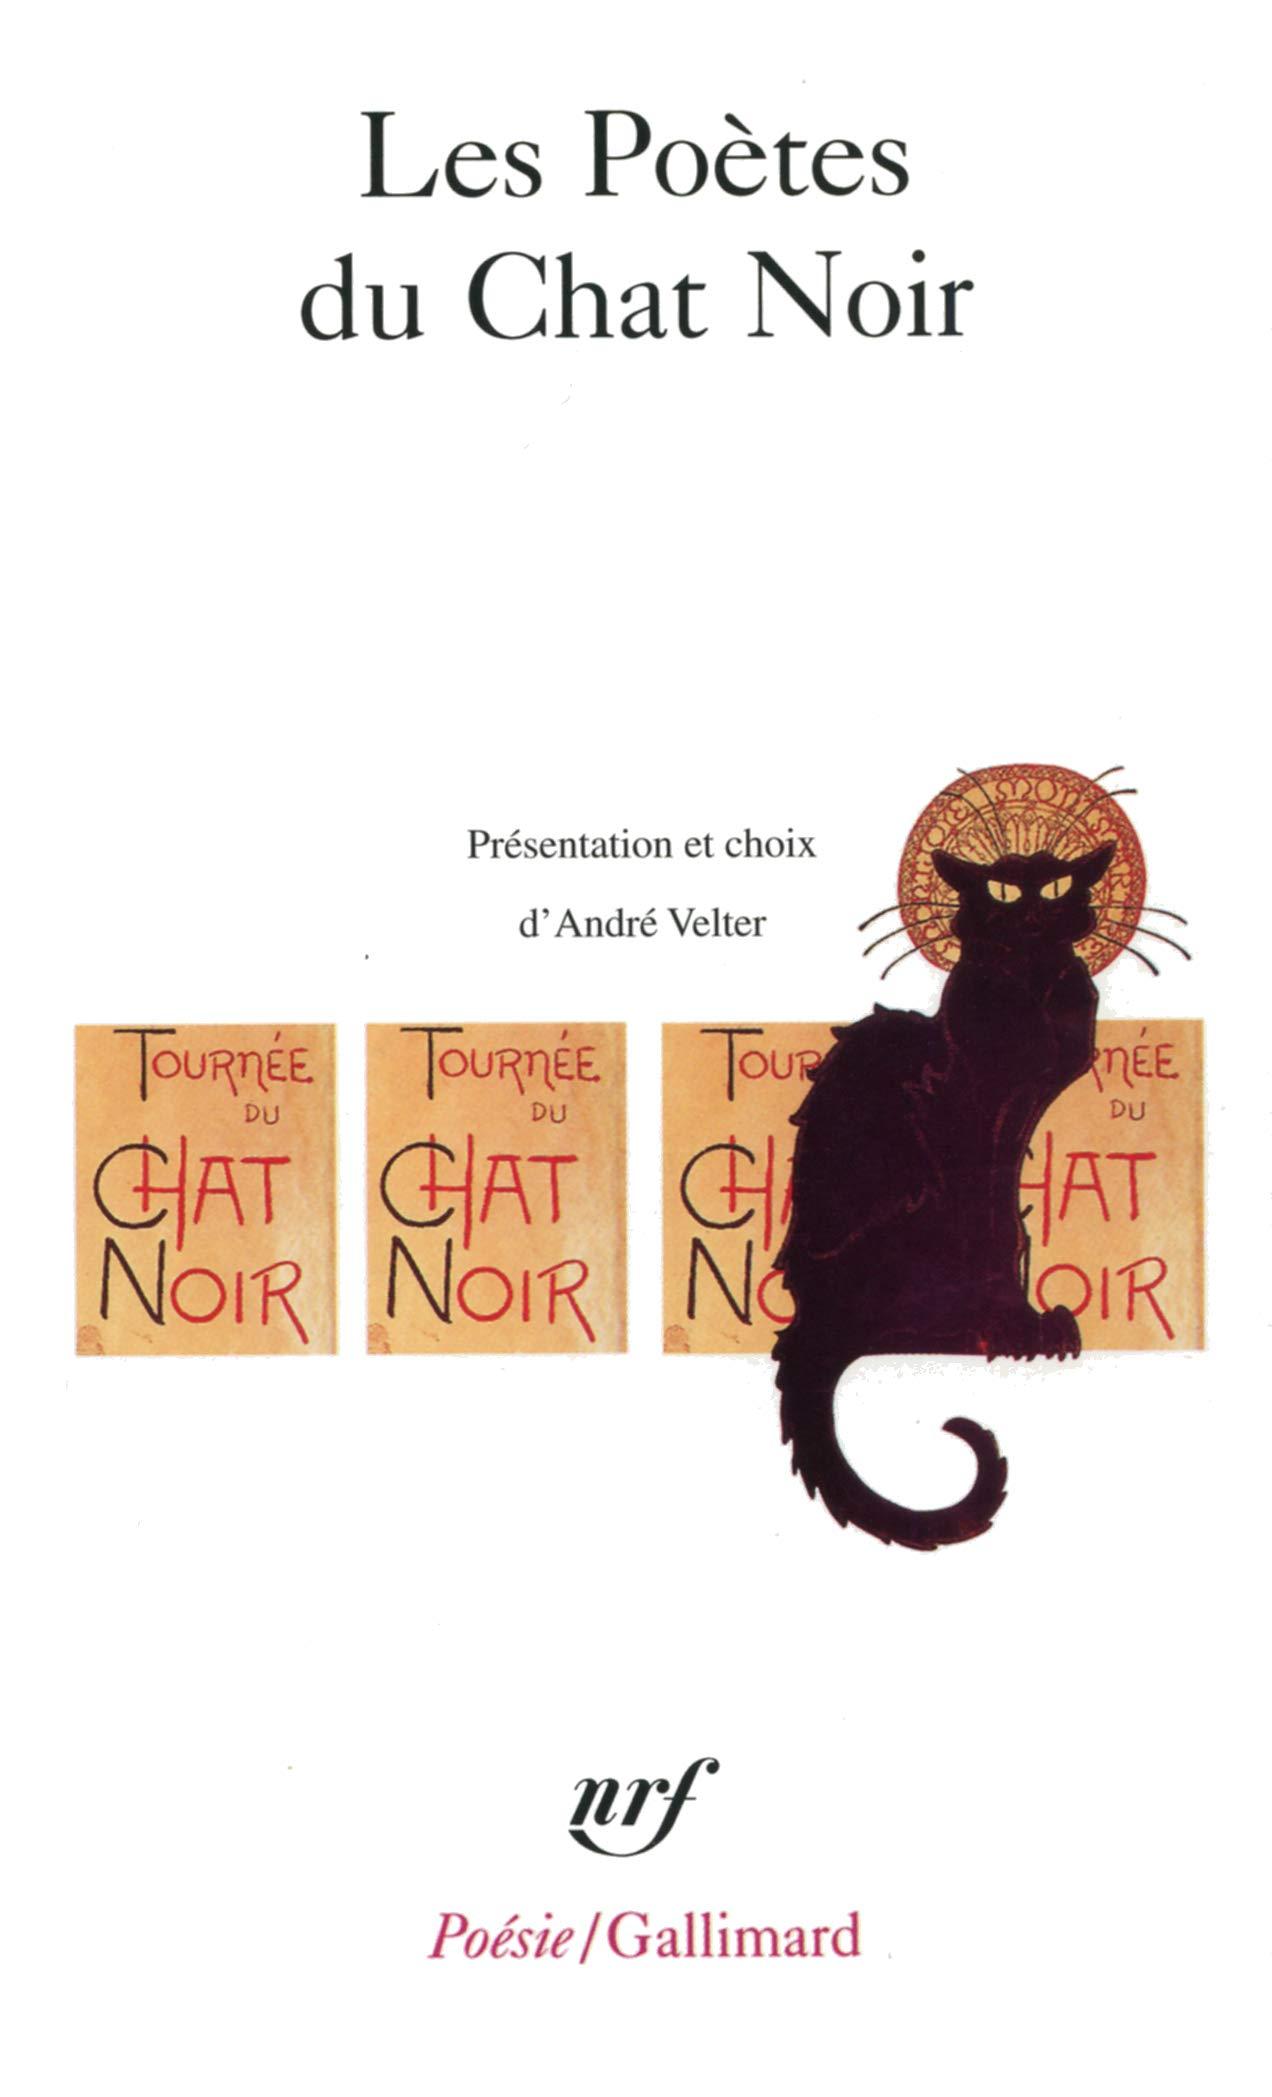 Buy Poetes Du Chat Noir A32898 Poesie Gallimard Book Online At Low Prices In India Poetes Du Chat Noir A32898 Poesie Gallimard Reviews Ratings Amazon In